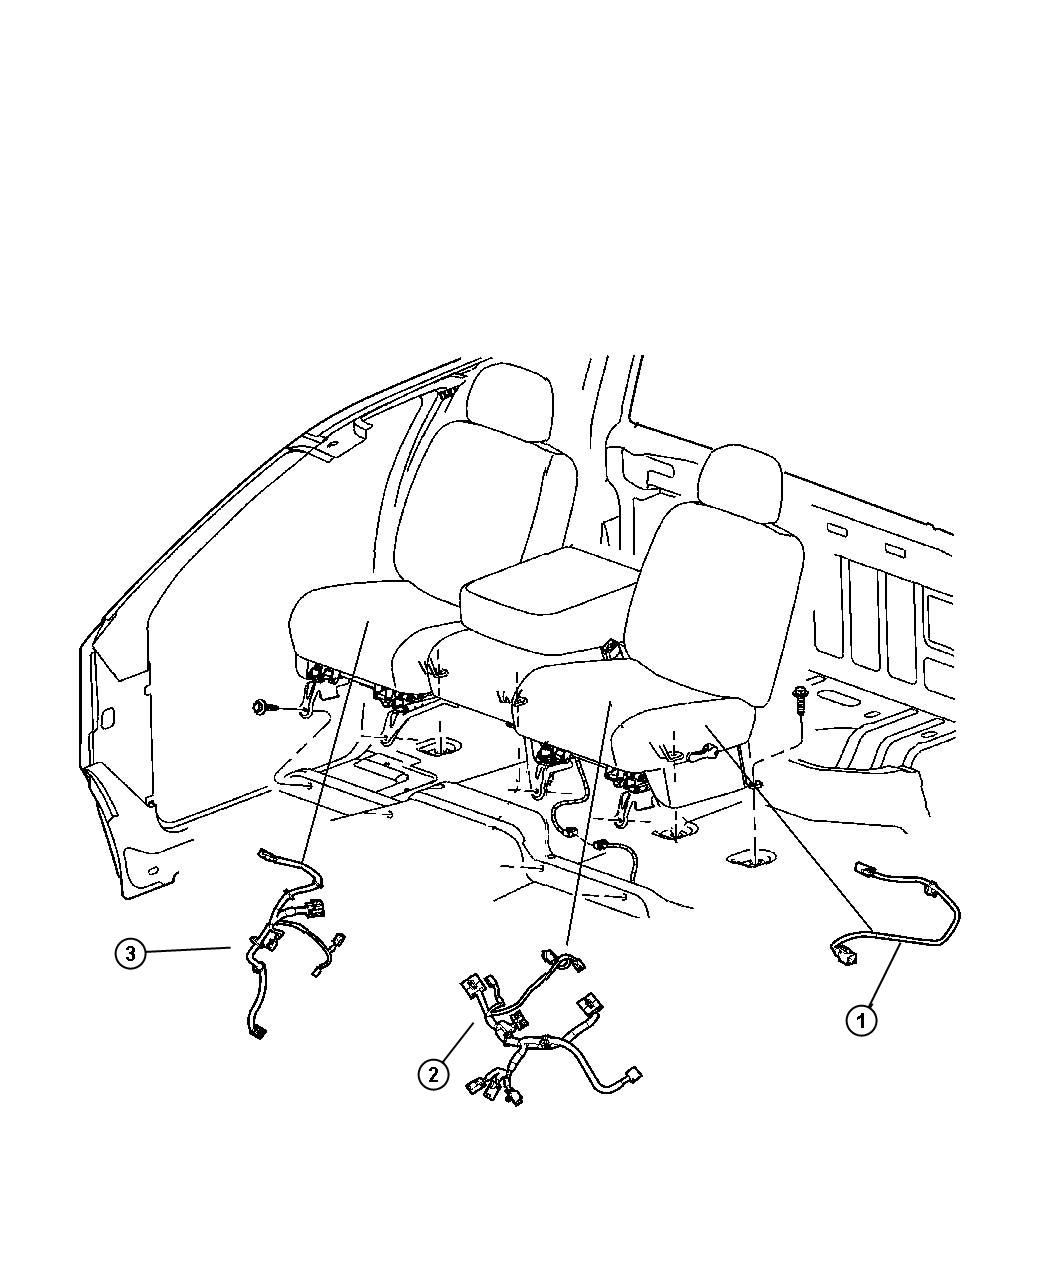 RAM Laramie Wiring. Power seat. [power 6-way driver seat